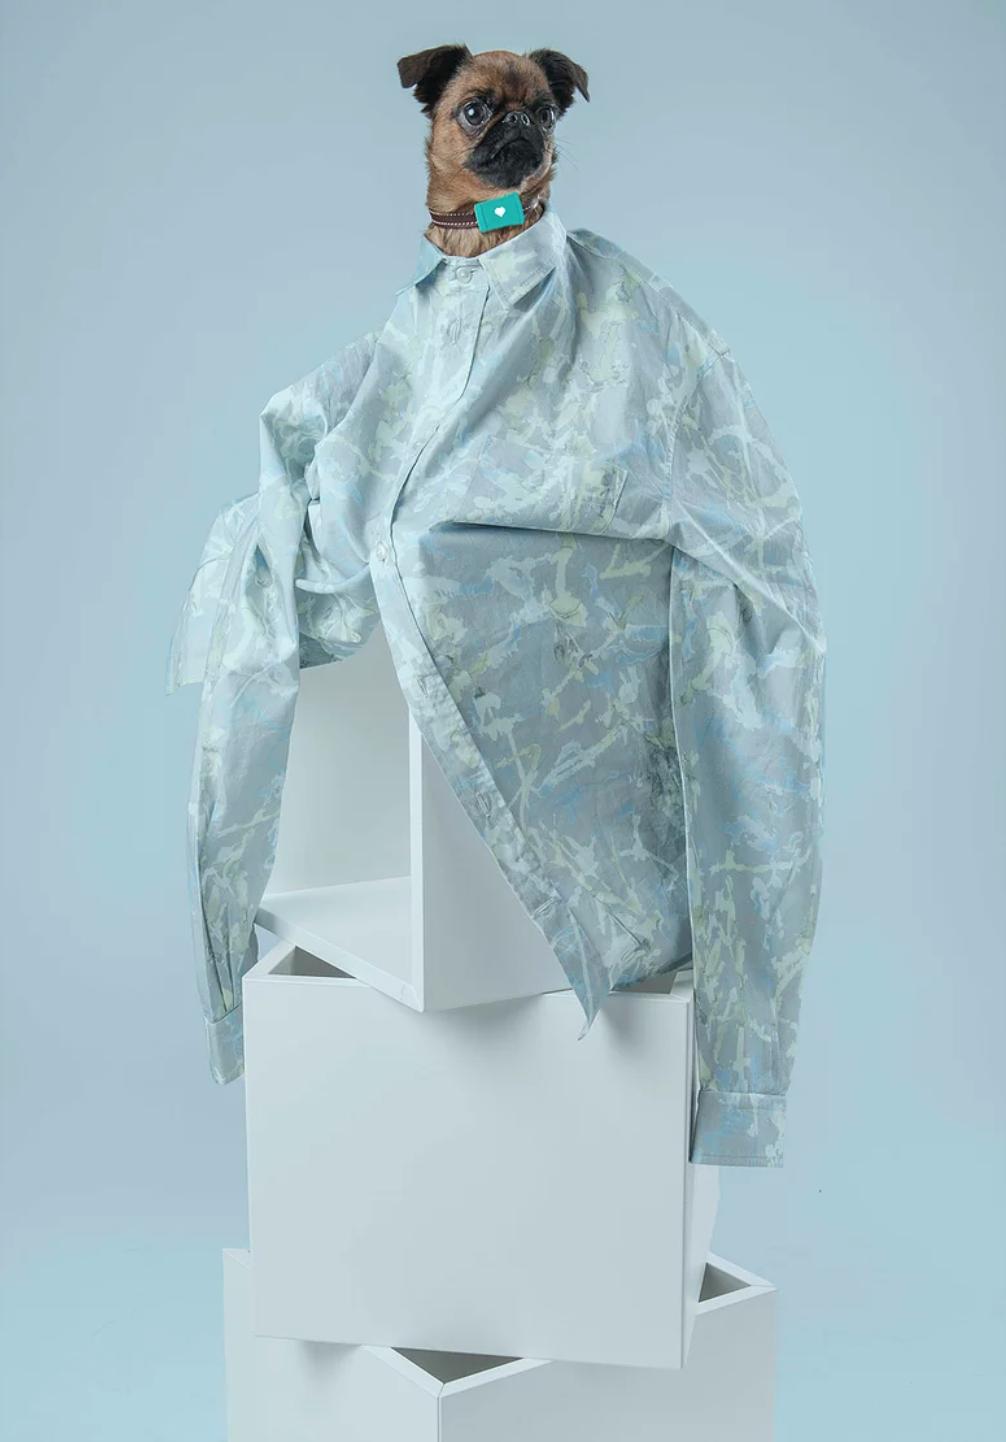 Artan Mansouri - Design - Art Direction - Product Design -Tracy Trackers